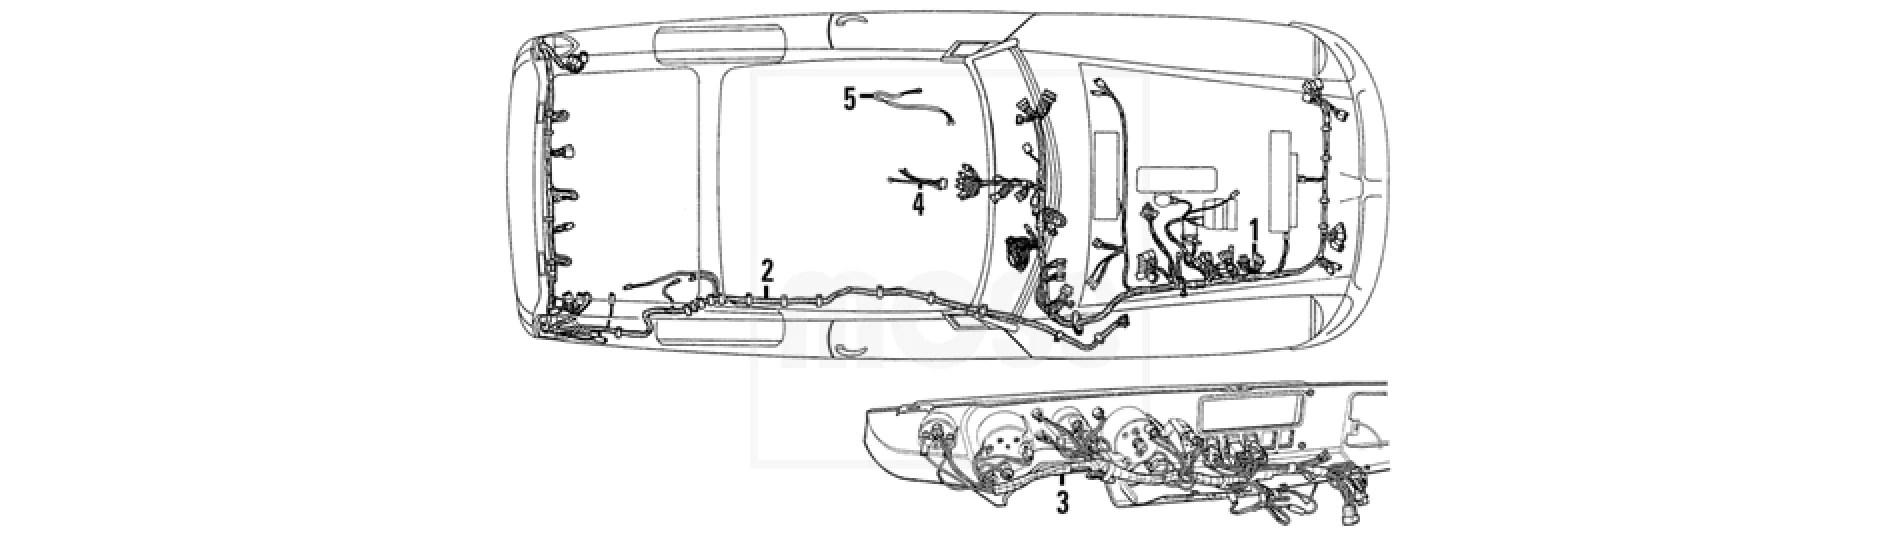 small resolution of  mgb wiring harness wiring diagram expert on 1976 midget wiring diagram 1976 triumph